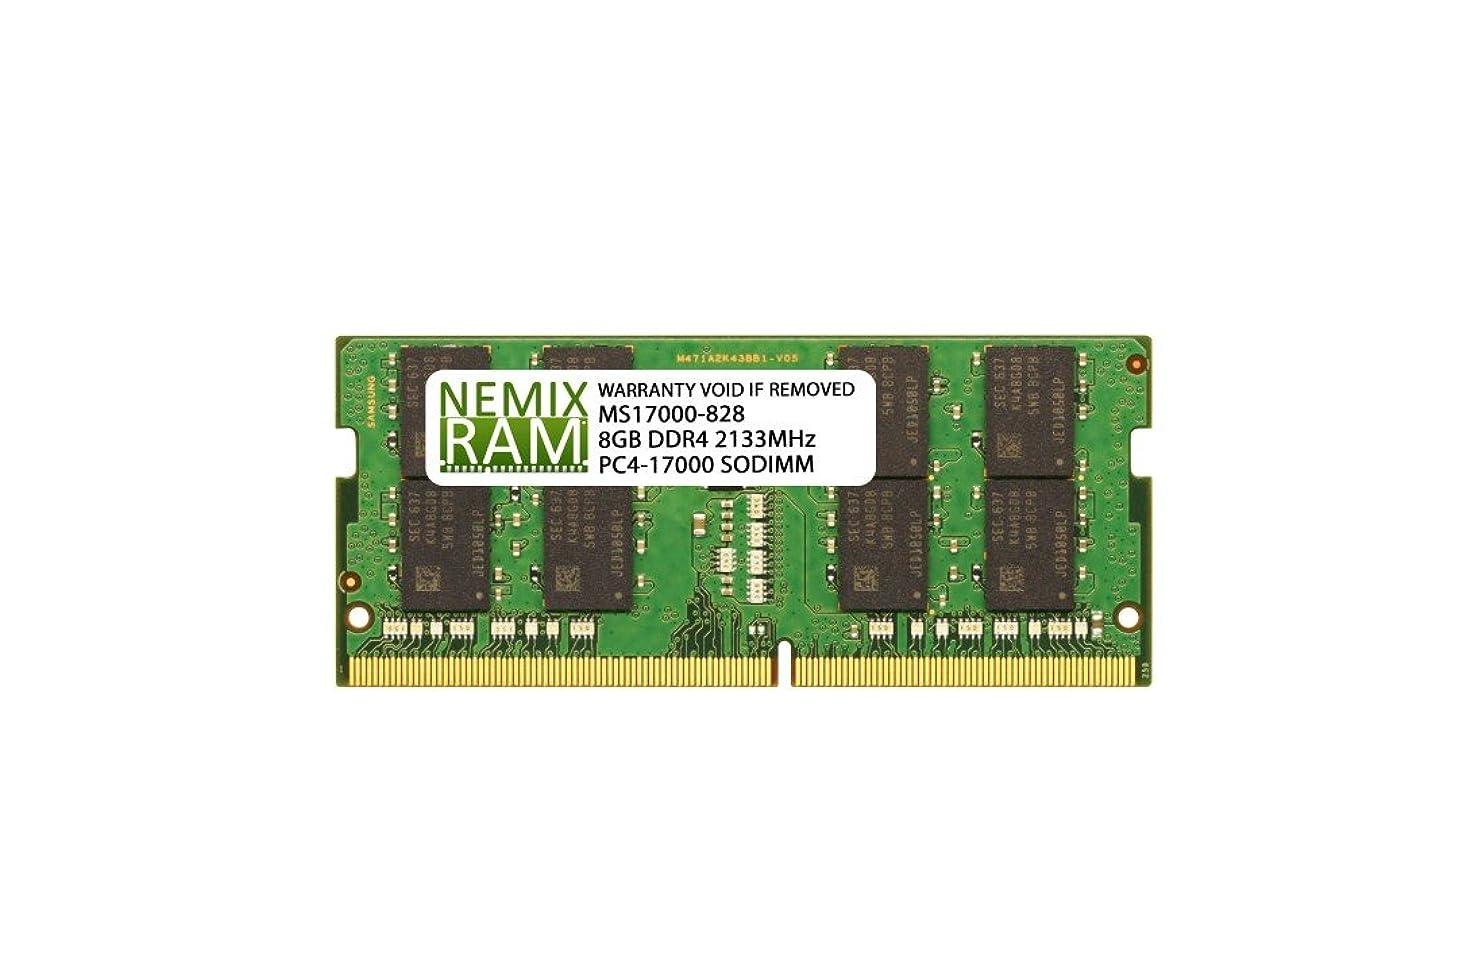 Supermicro MEM-DR480L-CL01-SO21 8GB DDR4 2133 SODIMM Memory RAM